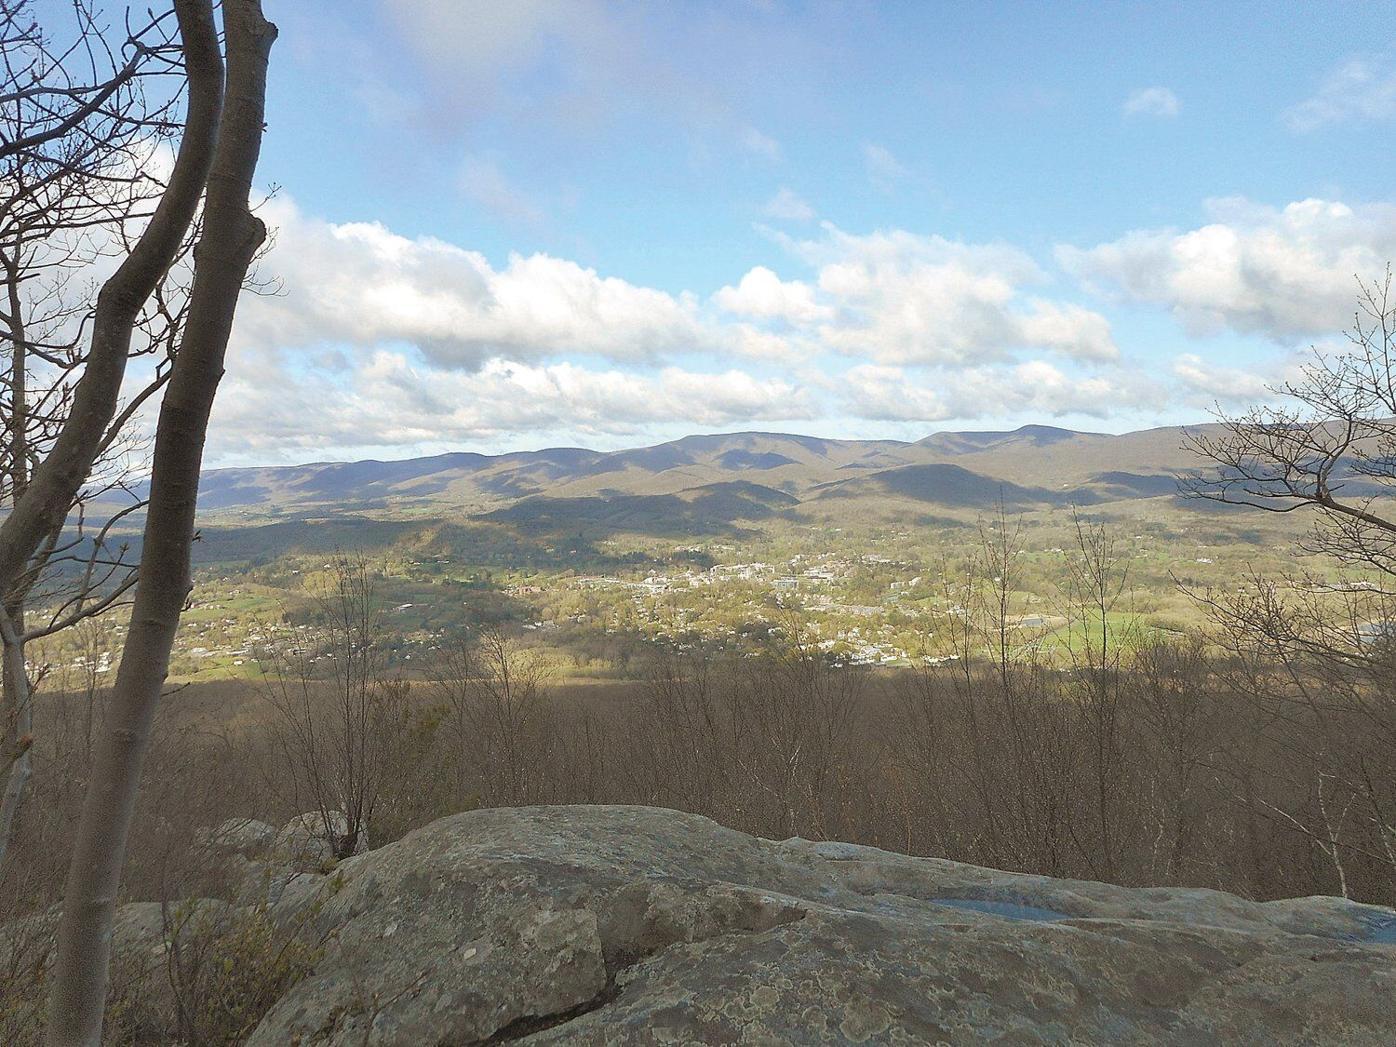 Lauren R. Stevens | Hikes & Walks: Searching for azaleas from East Mountain to Pine Cobble